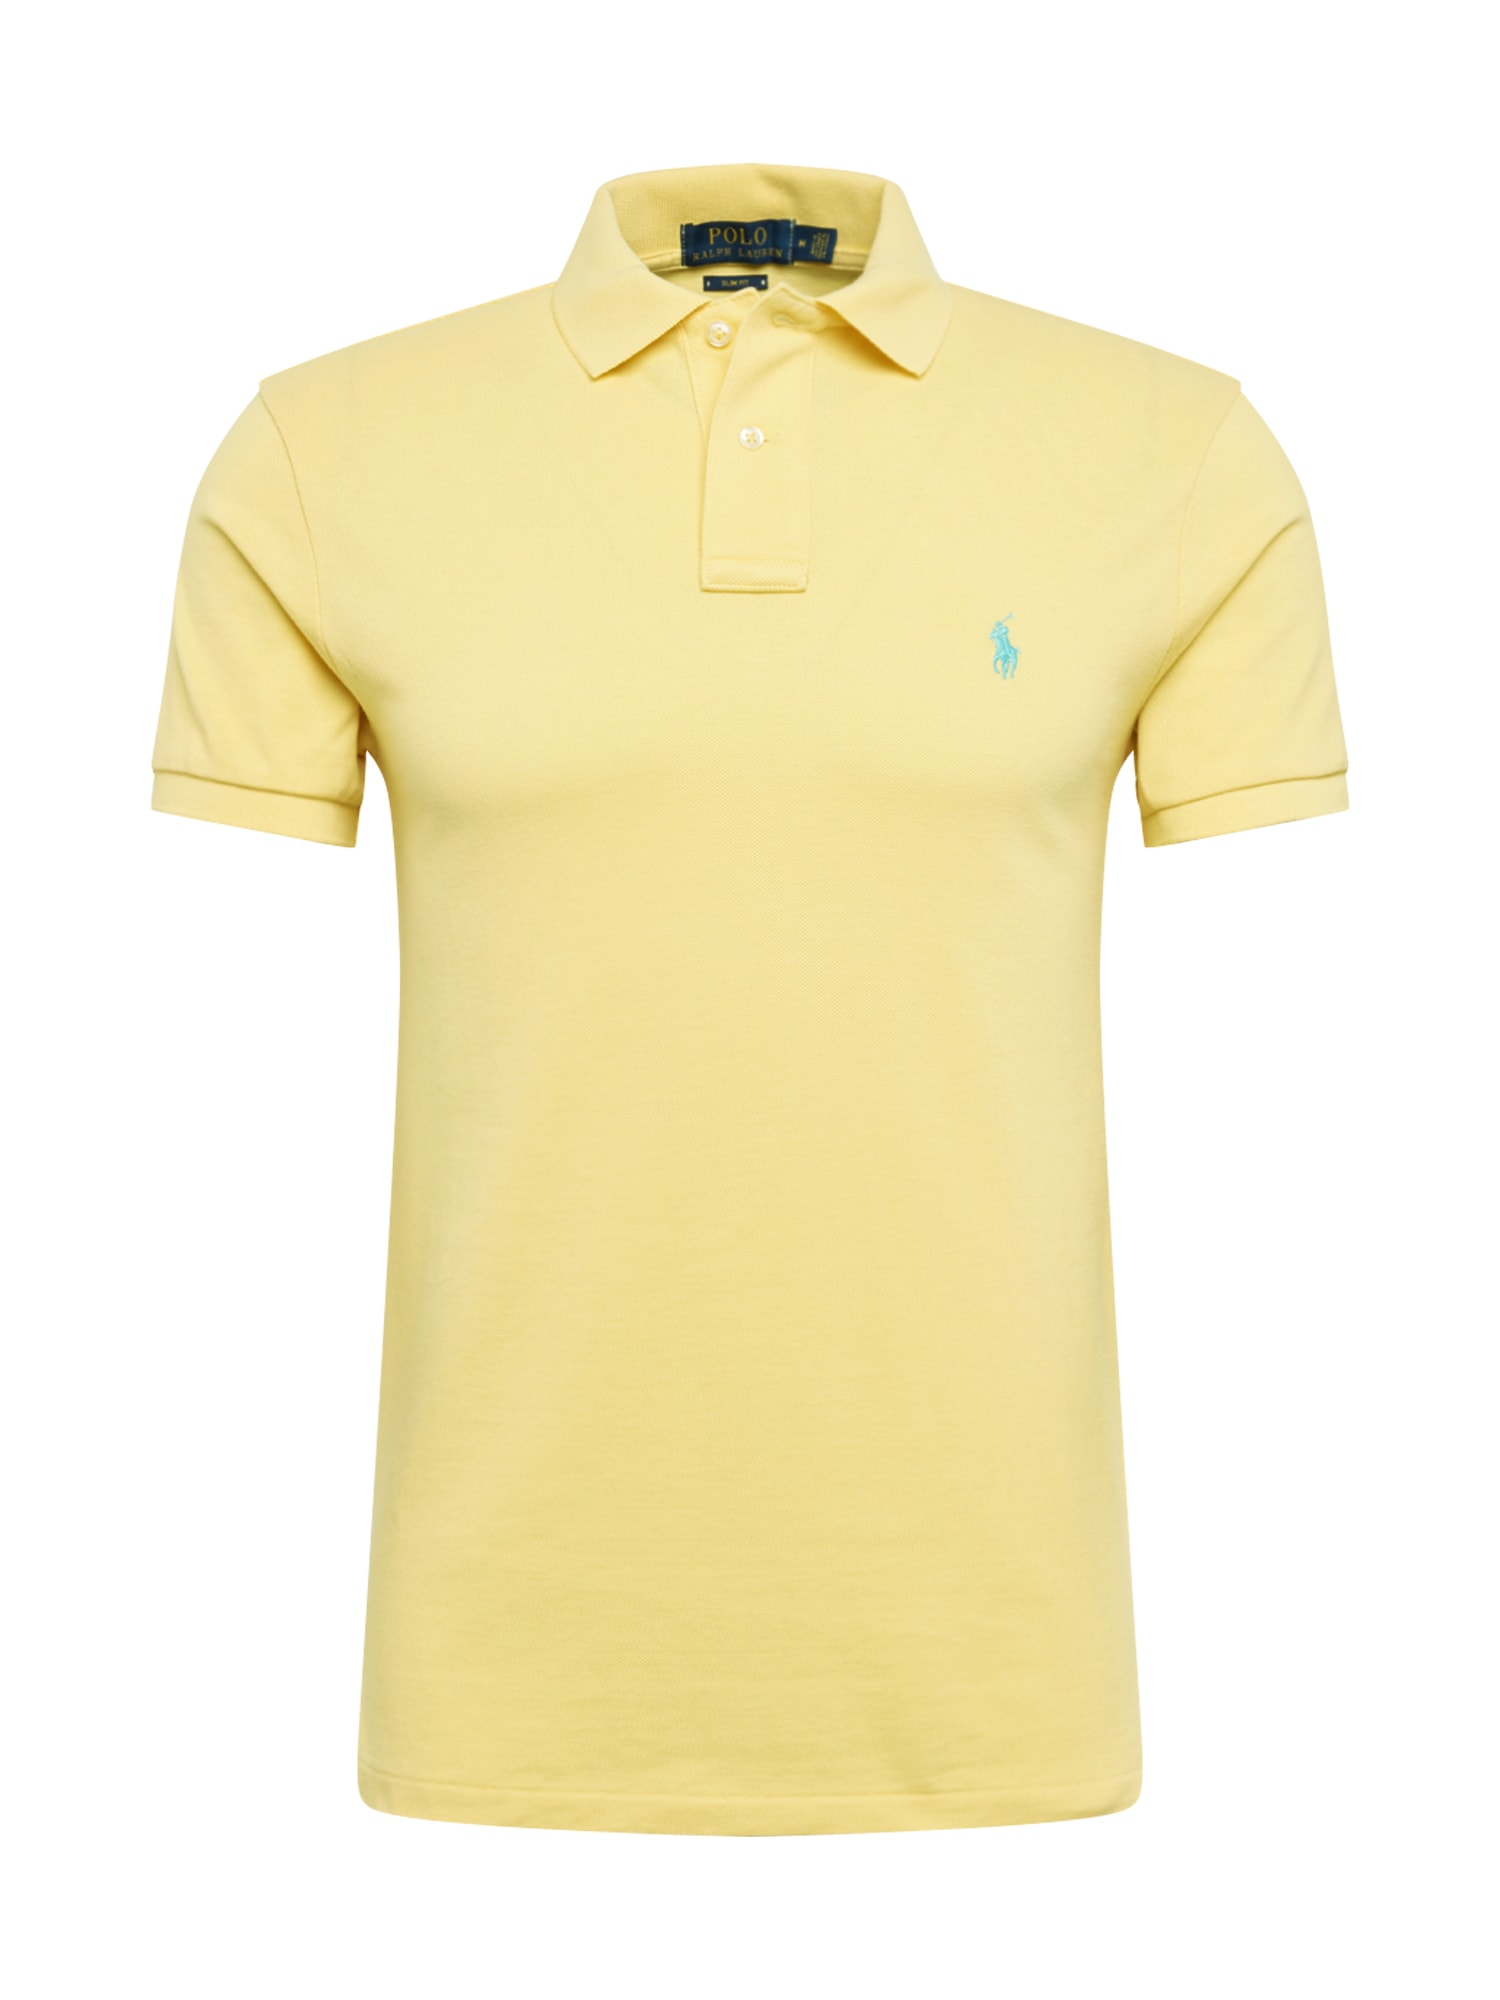 POLO RALPH LAUREN Marškinėliai geltona